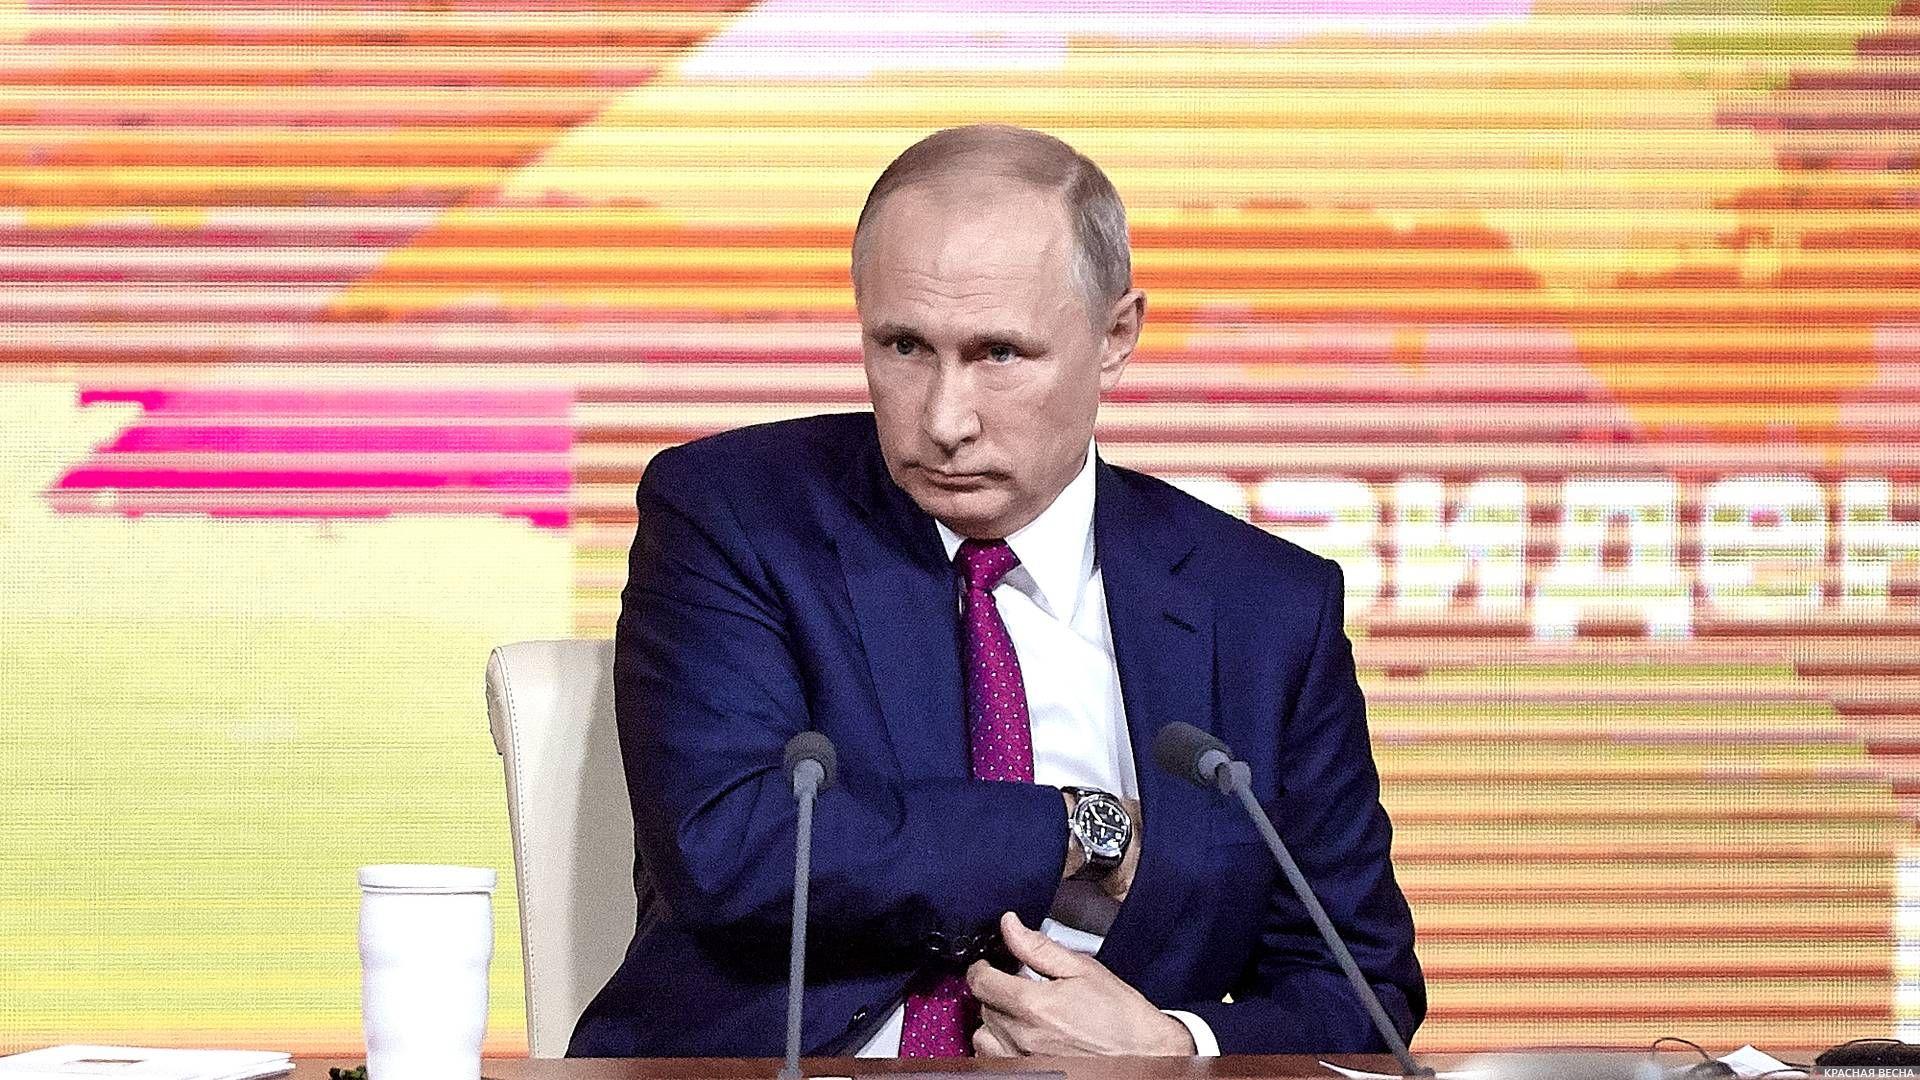 Путин сократил замглавыГУ МВД поКраснодарскому краю Юрия Кузнецова